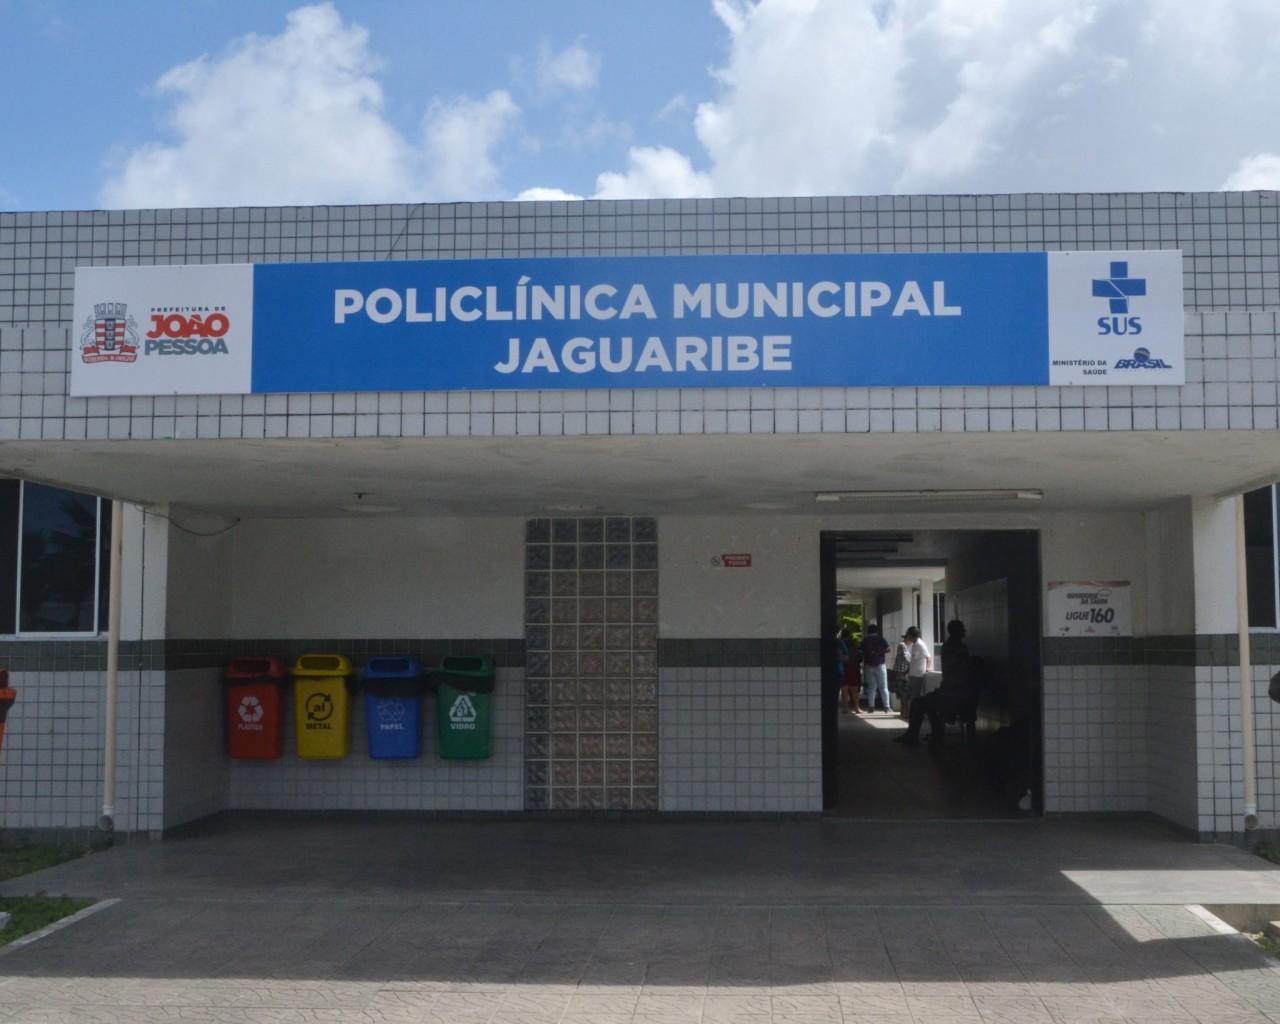 policlinica jaguaribe - Policlínica Municipal Jaguaribe oferece testes para a Covid-19; saiba como fazer